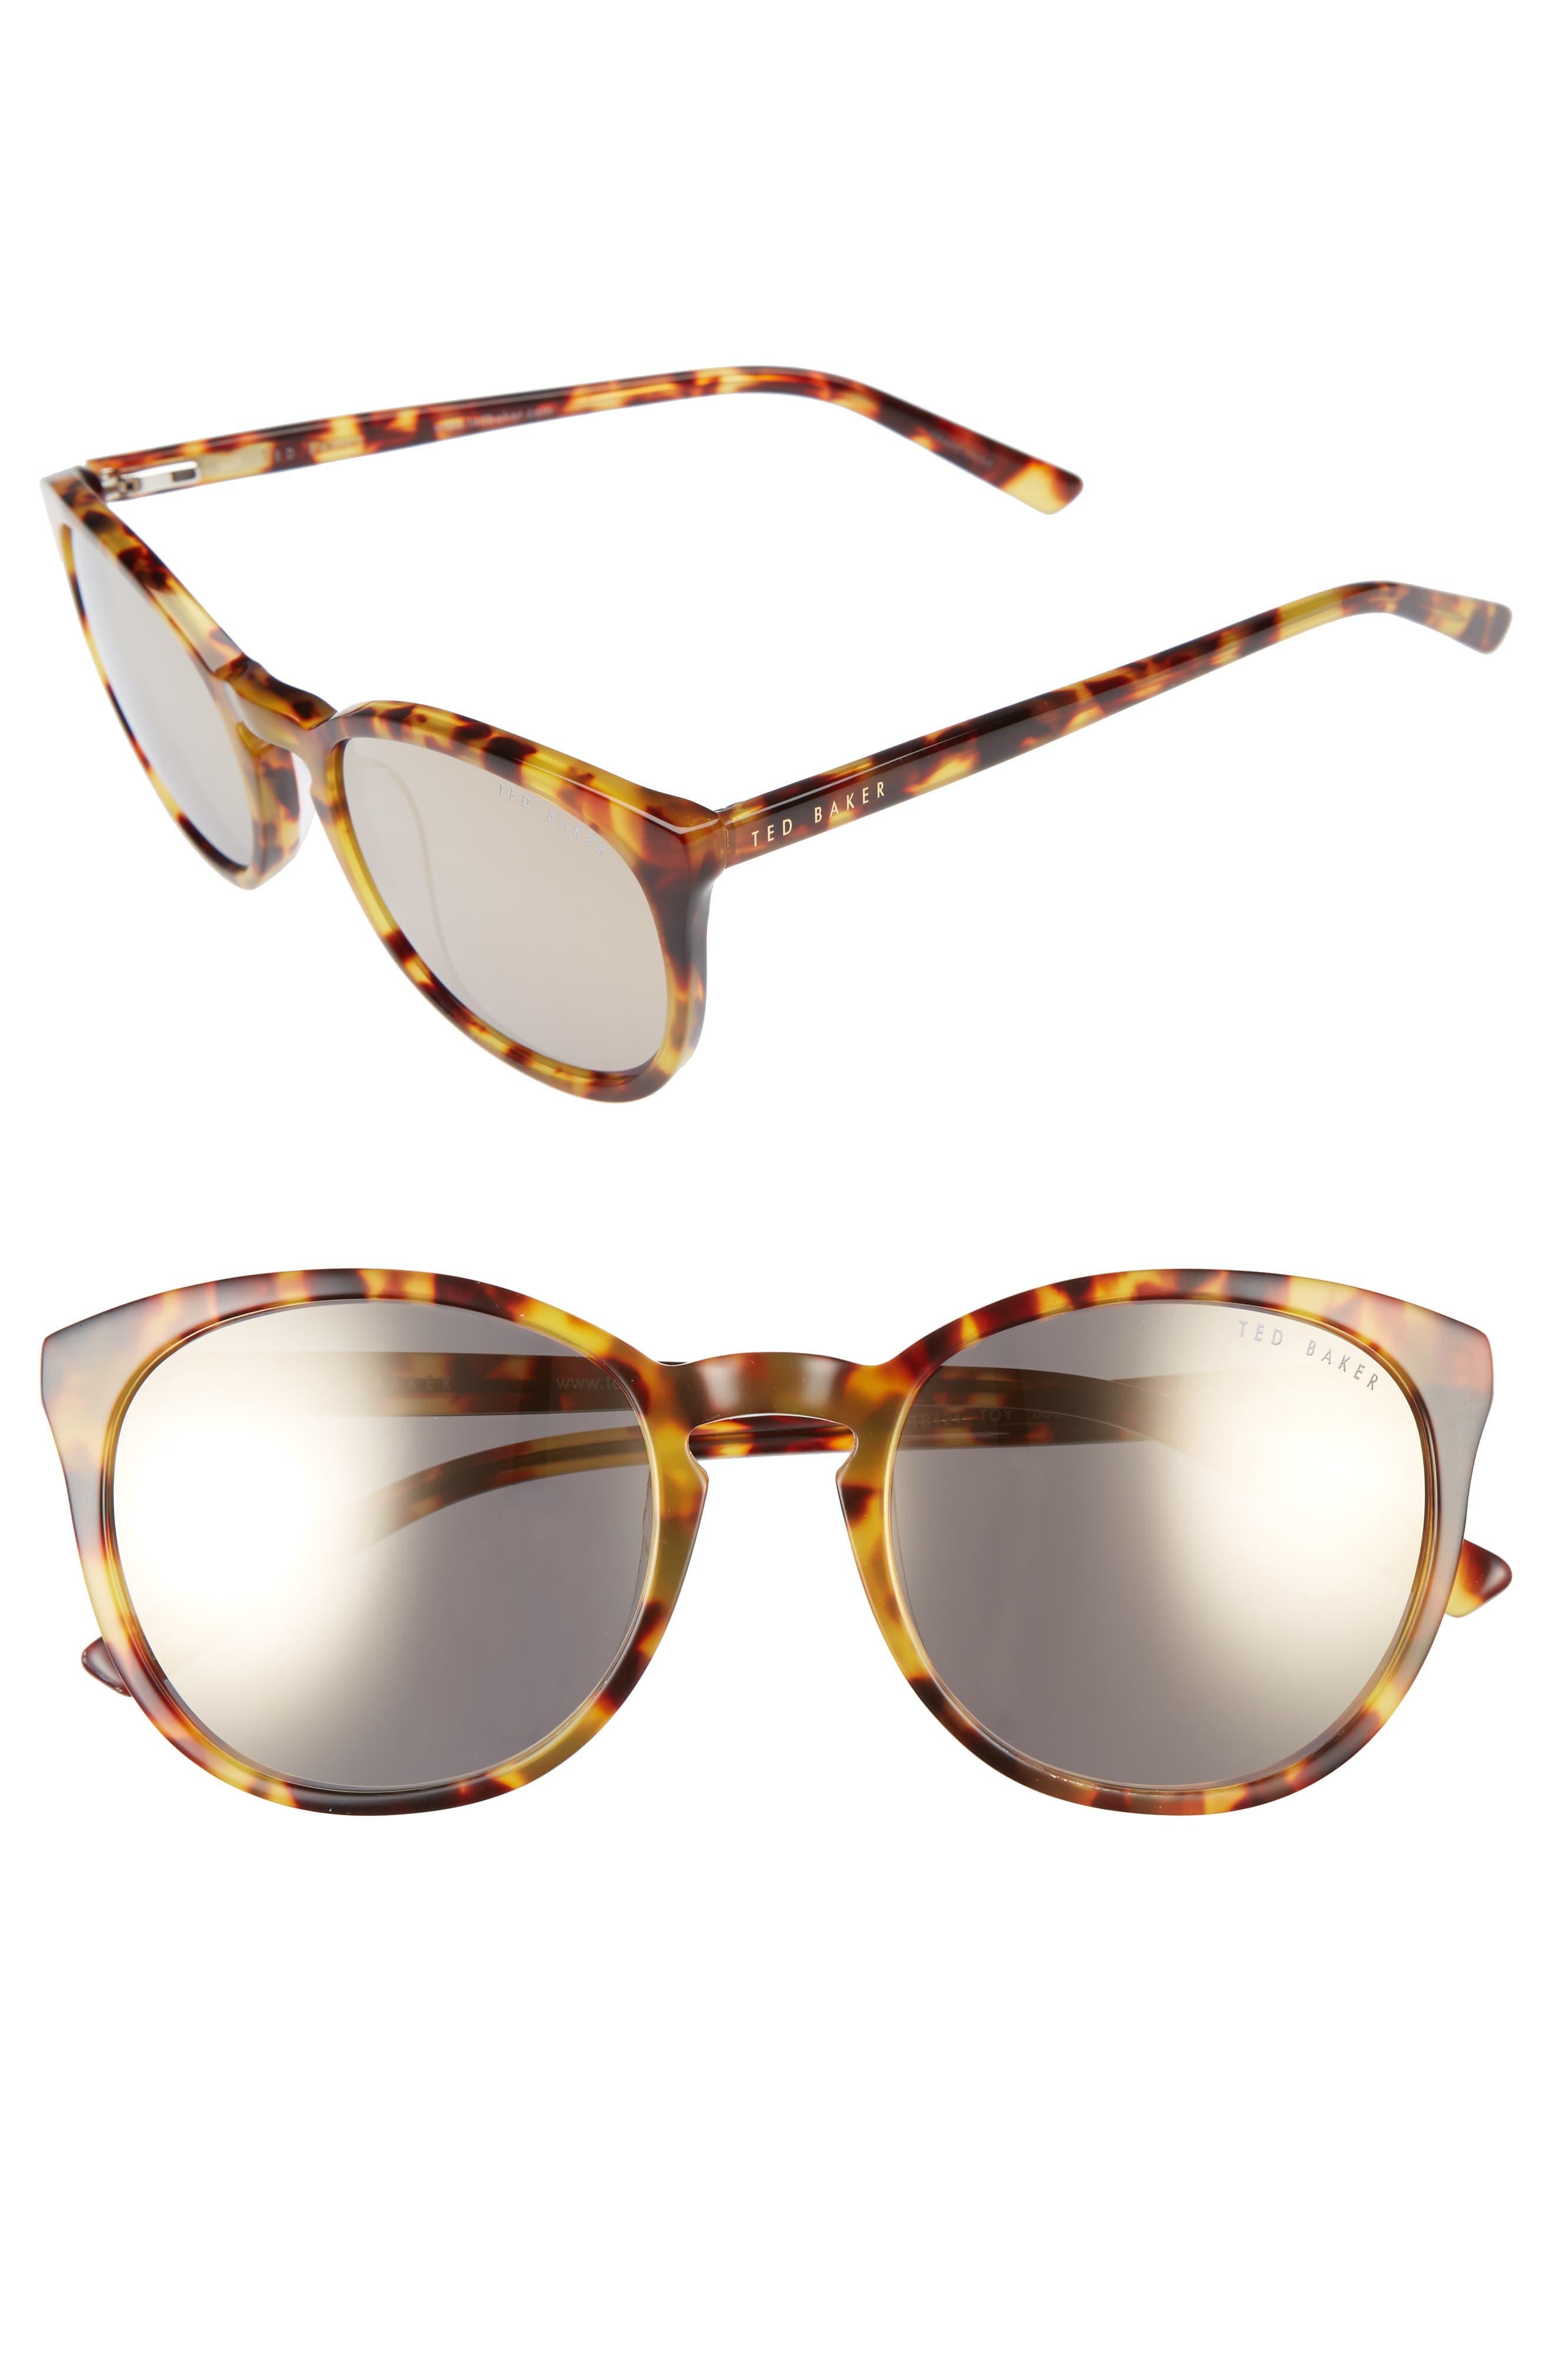 53mm Round Sunglasses,                             Main thumbnail 2, color,